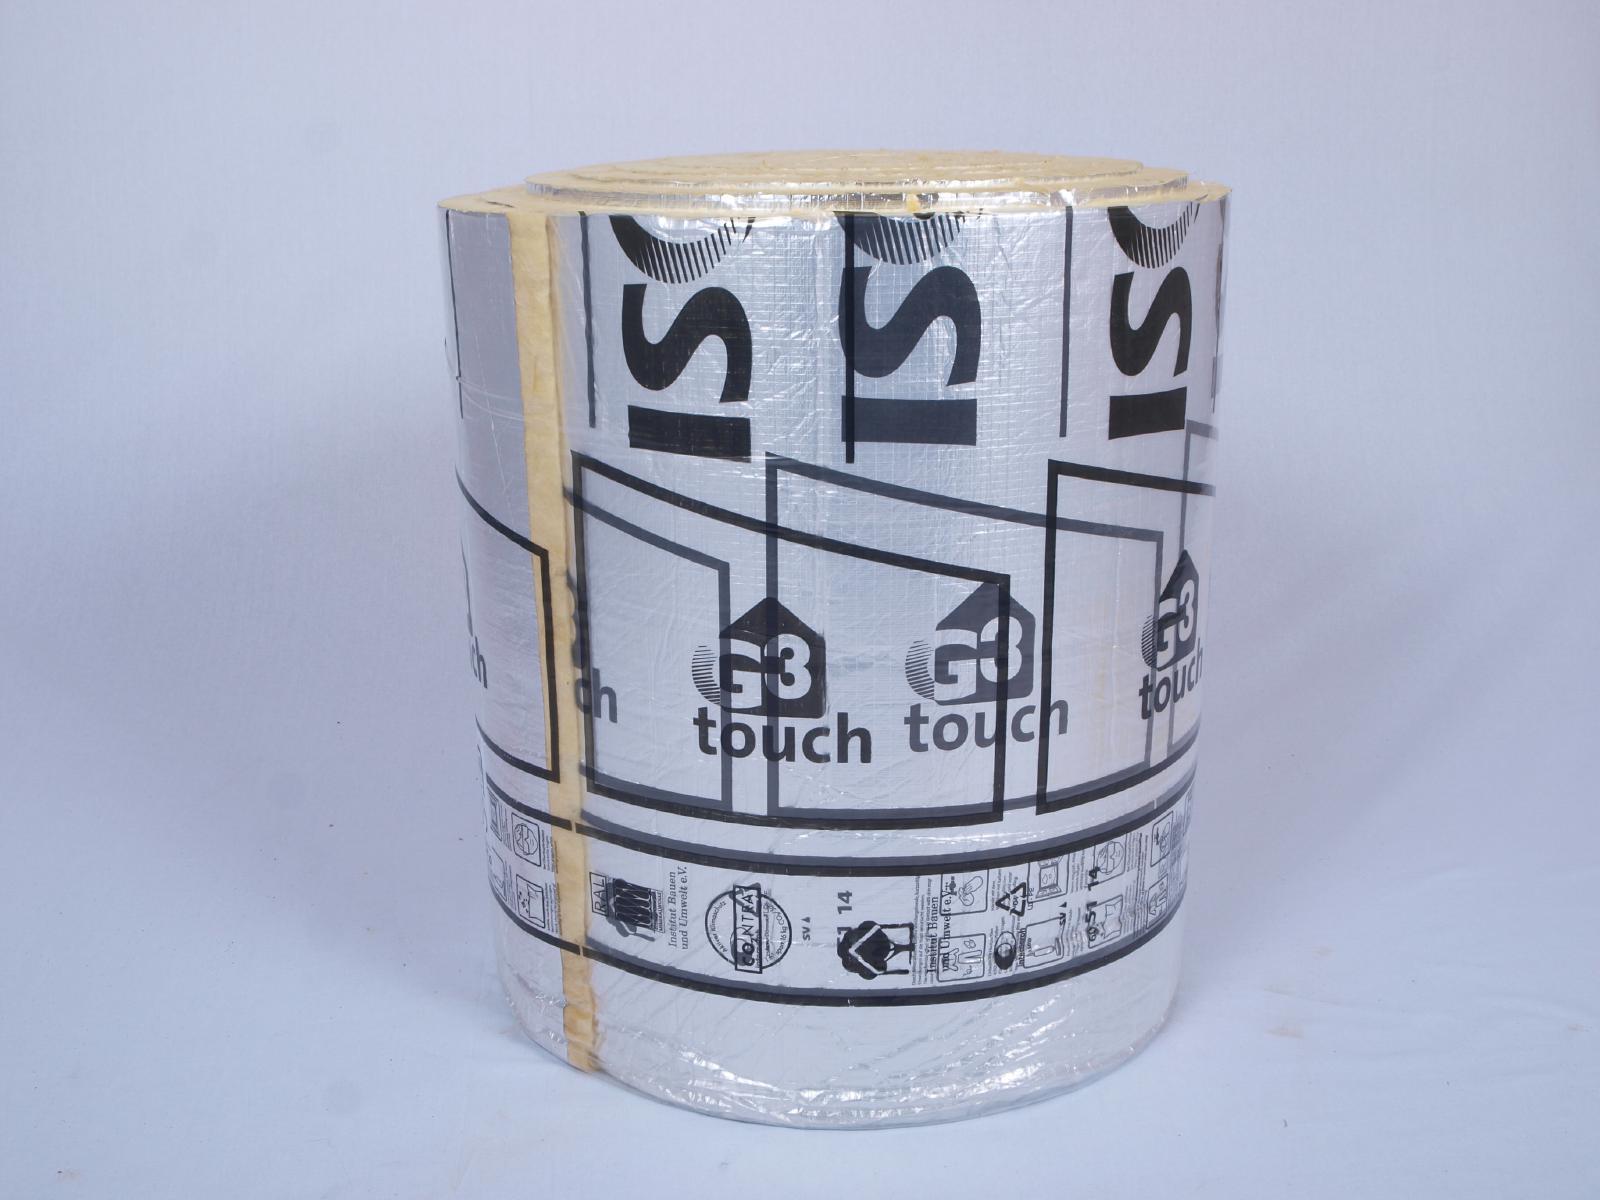 isover lamellenmatte ml3 40 mm alukaschiert 3 6 m halbes p euro pro m ebay. Black Bedroom Furniture Sets. Home Design Ideas